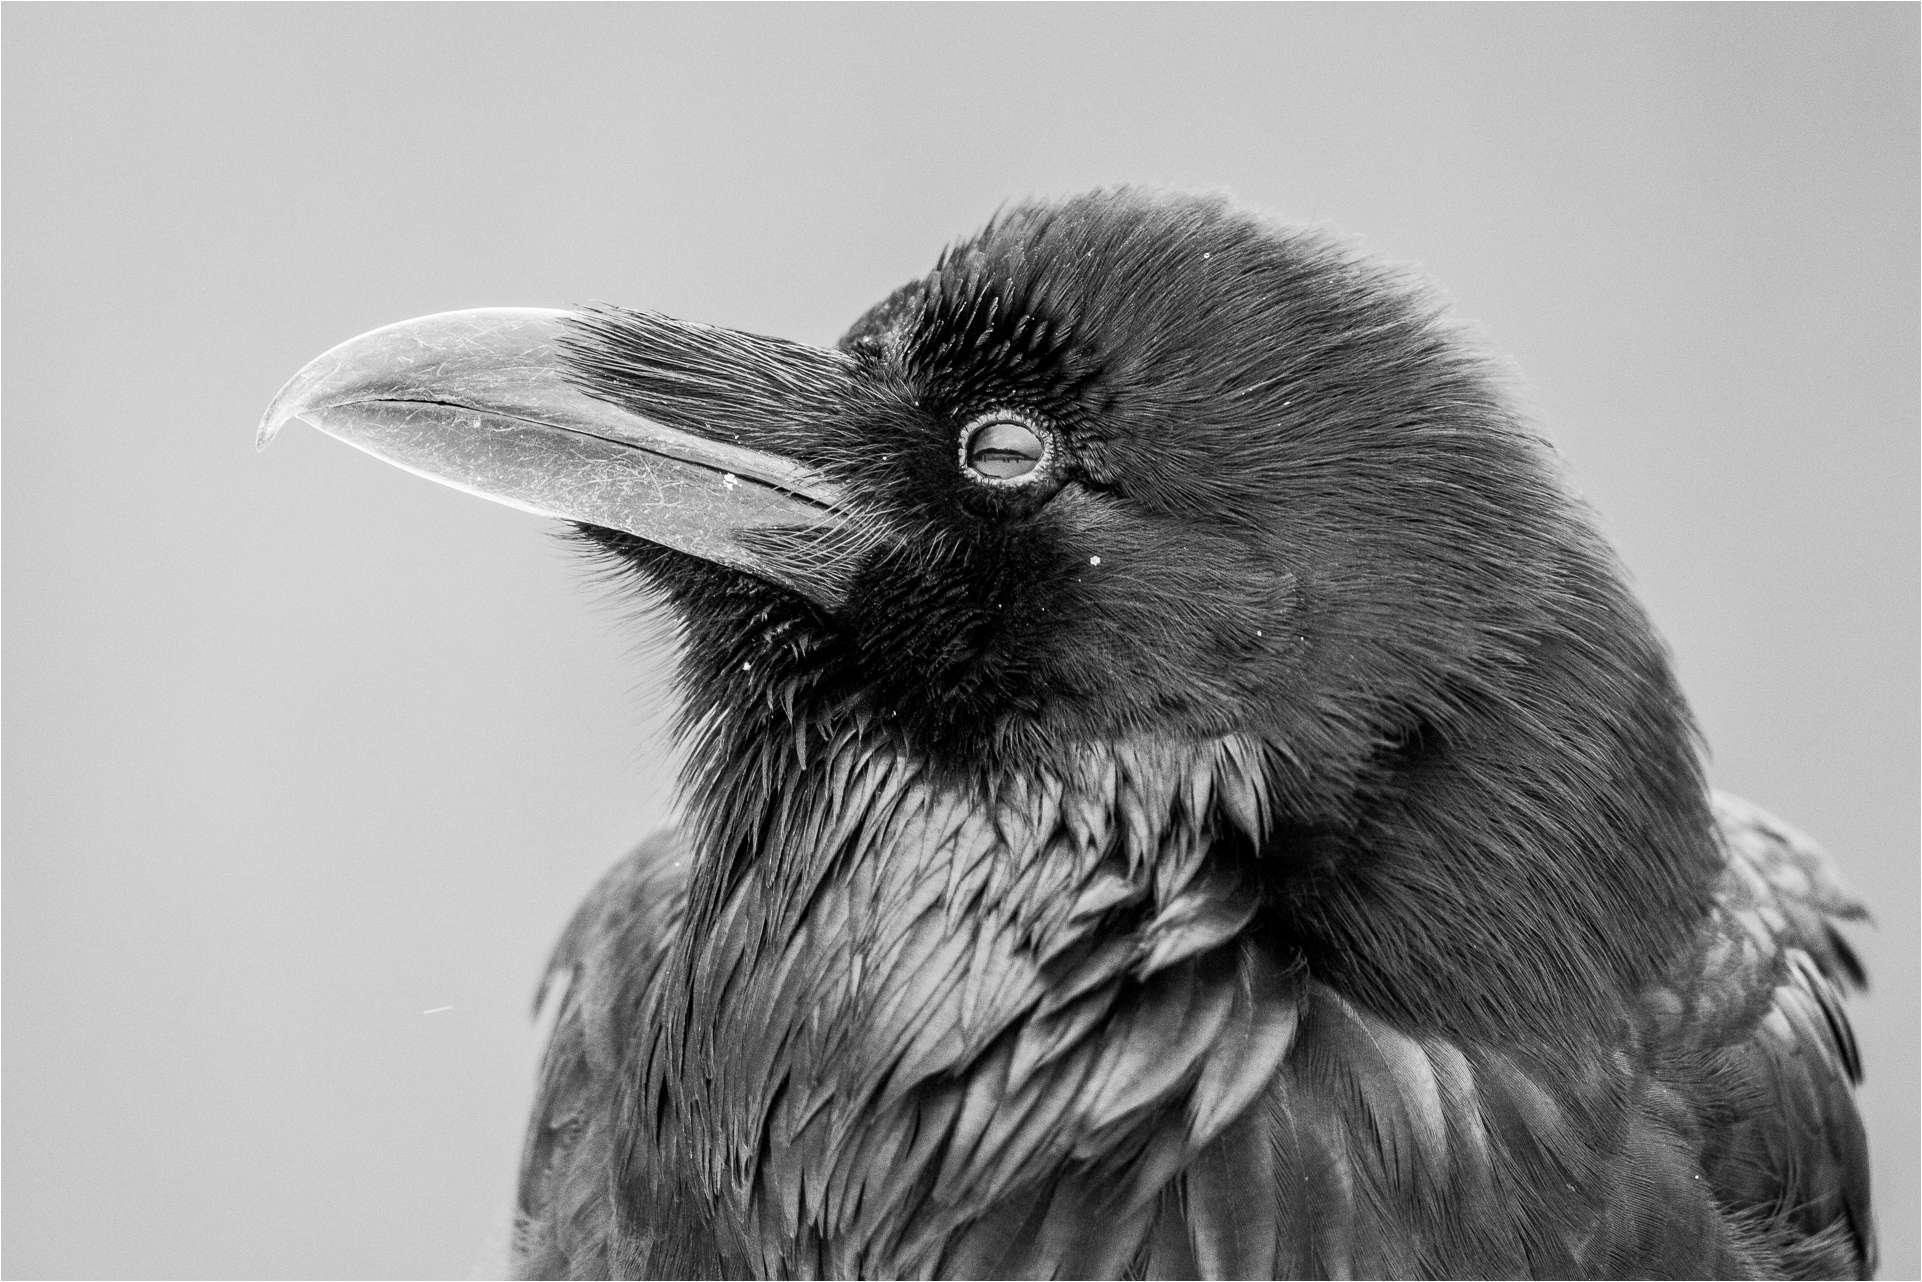 Raven profile - © Christopher Martin-6264